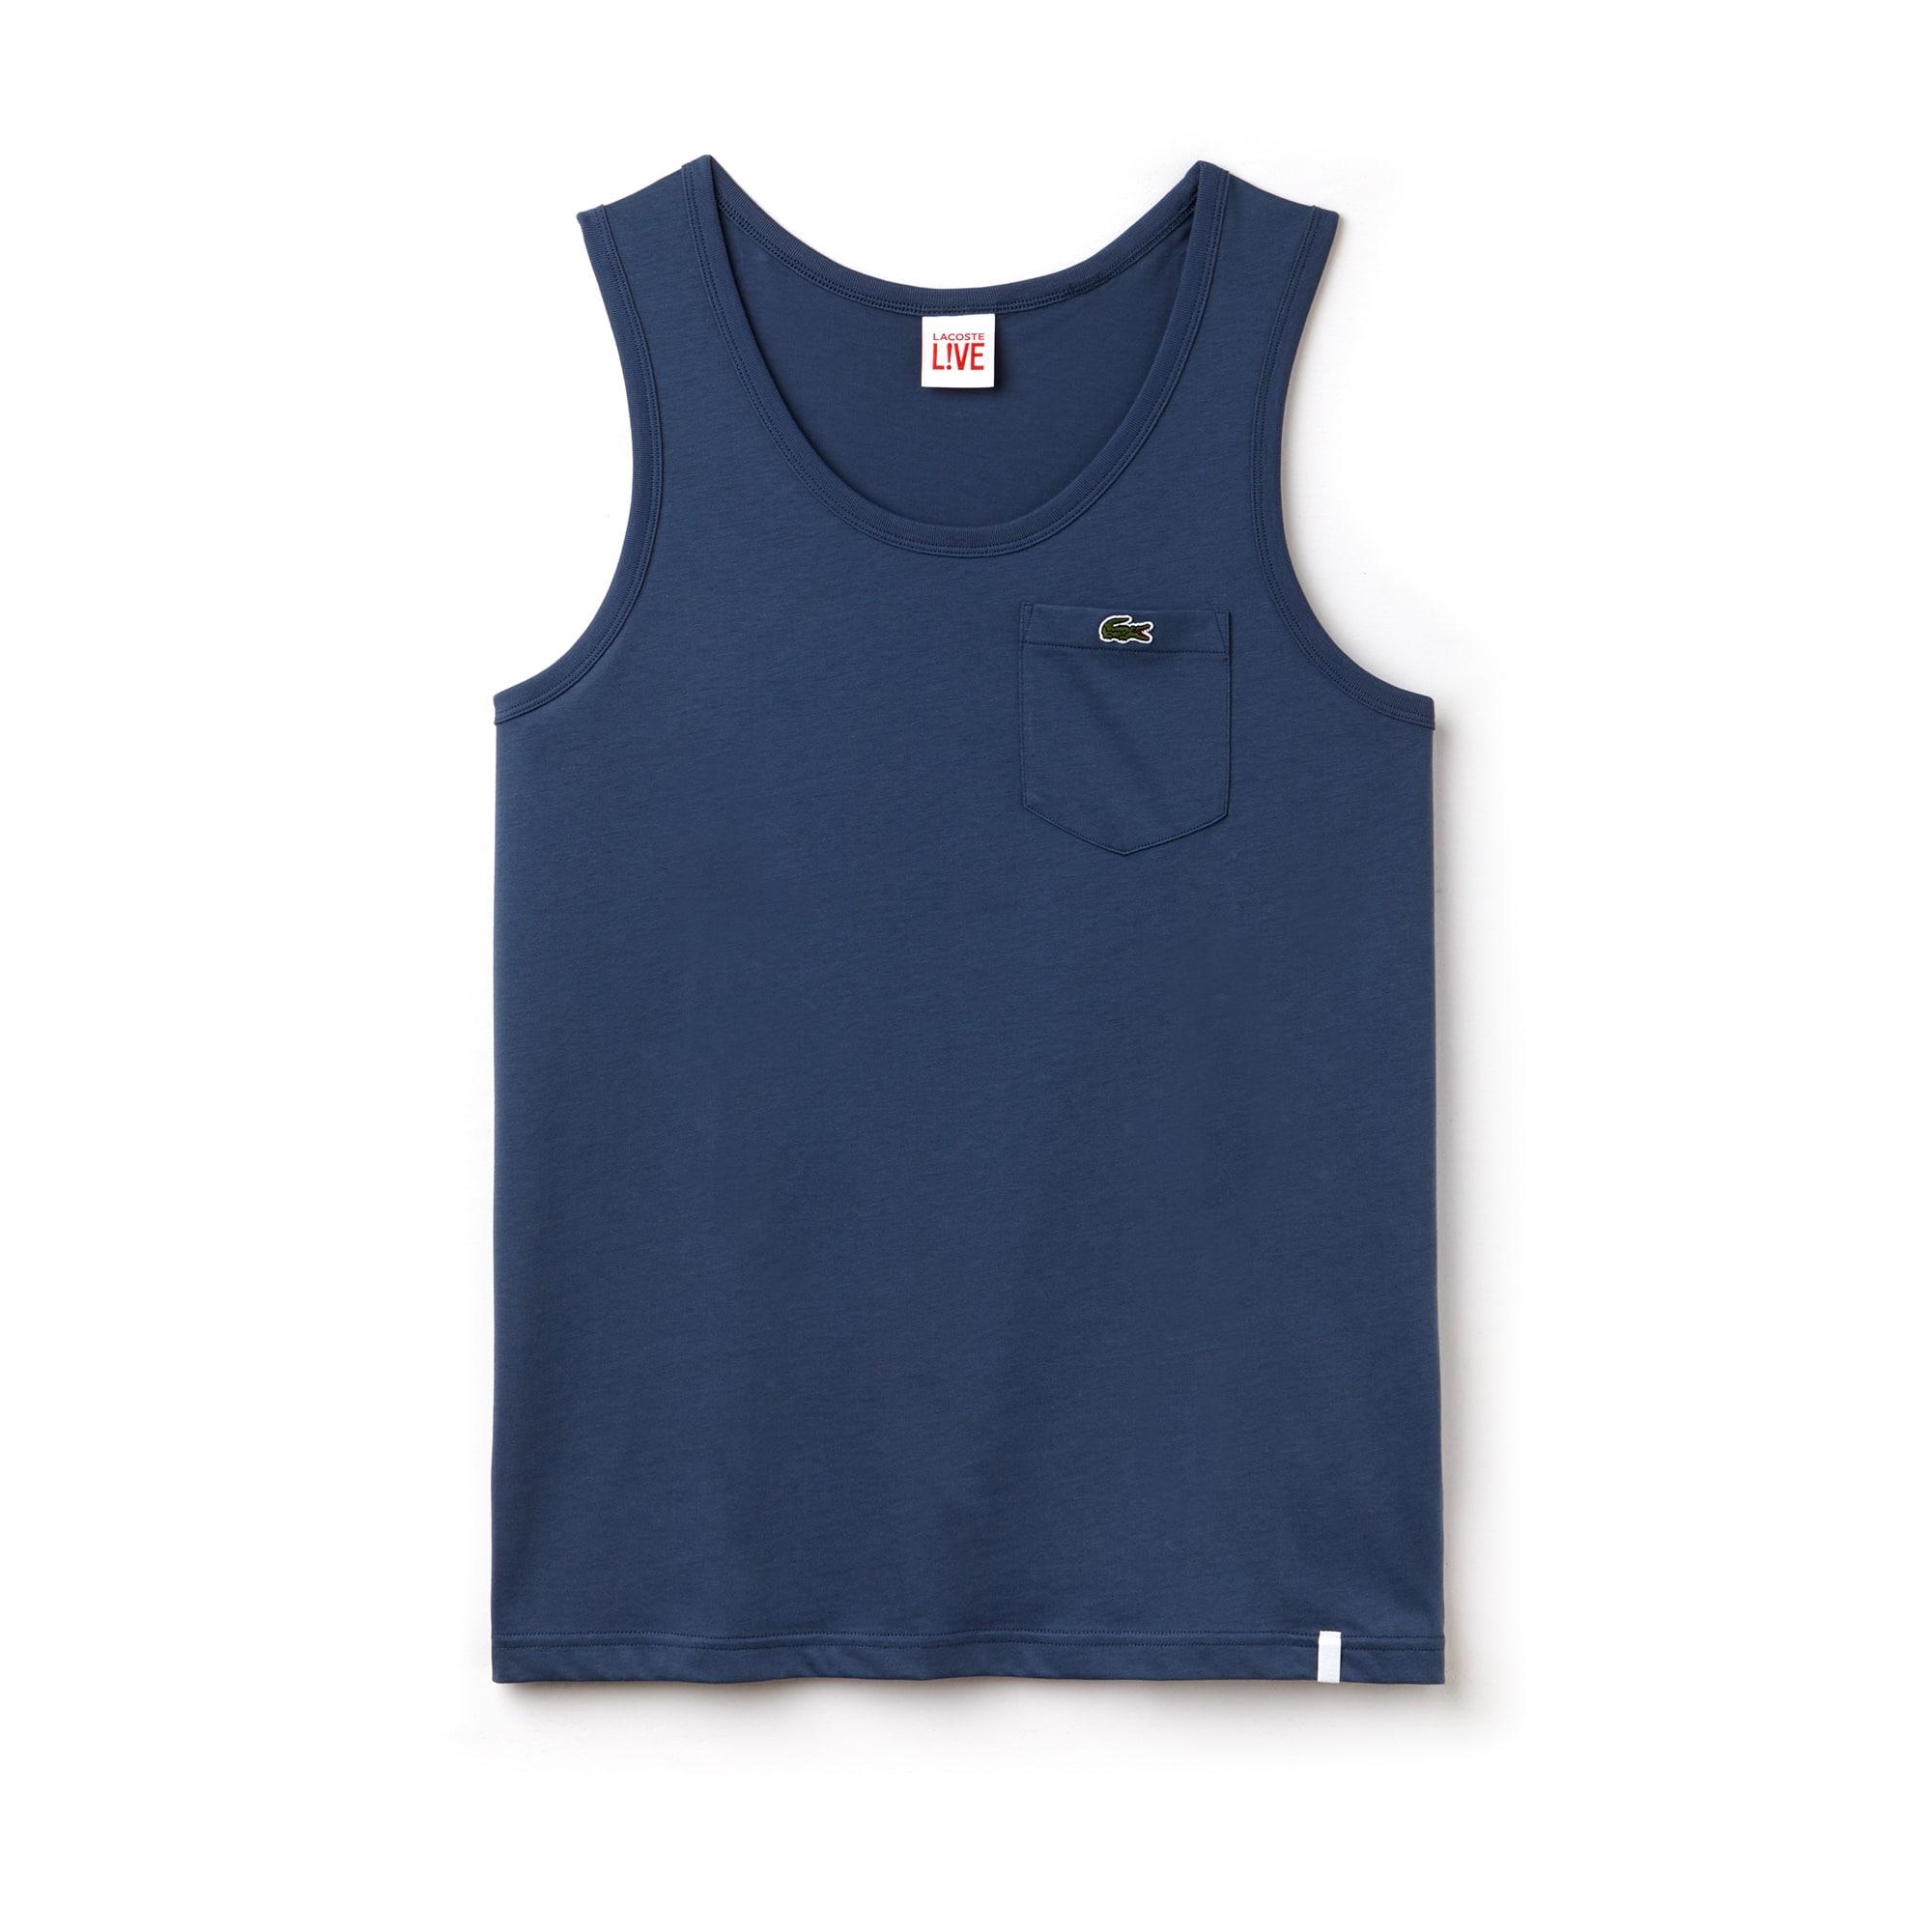 Men's LIVE Pocket Cotton Jersey Tank Top